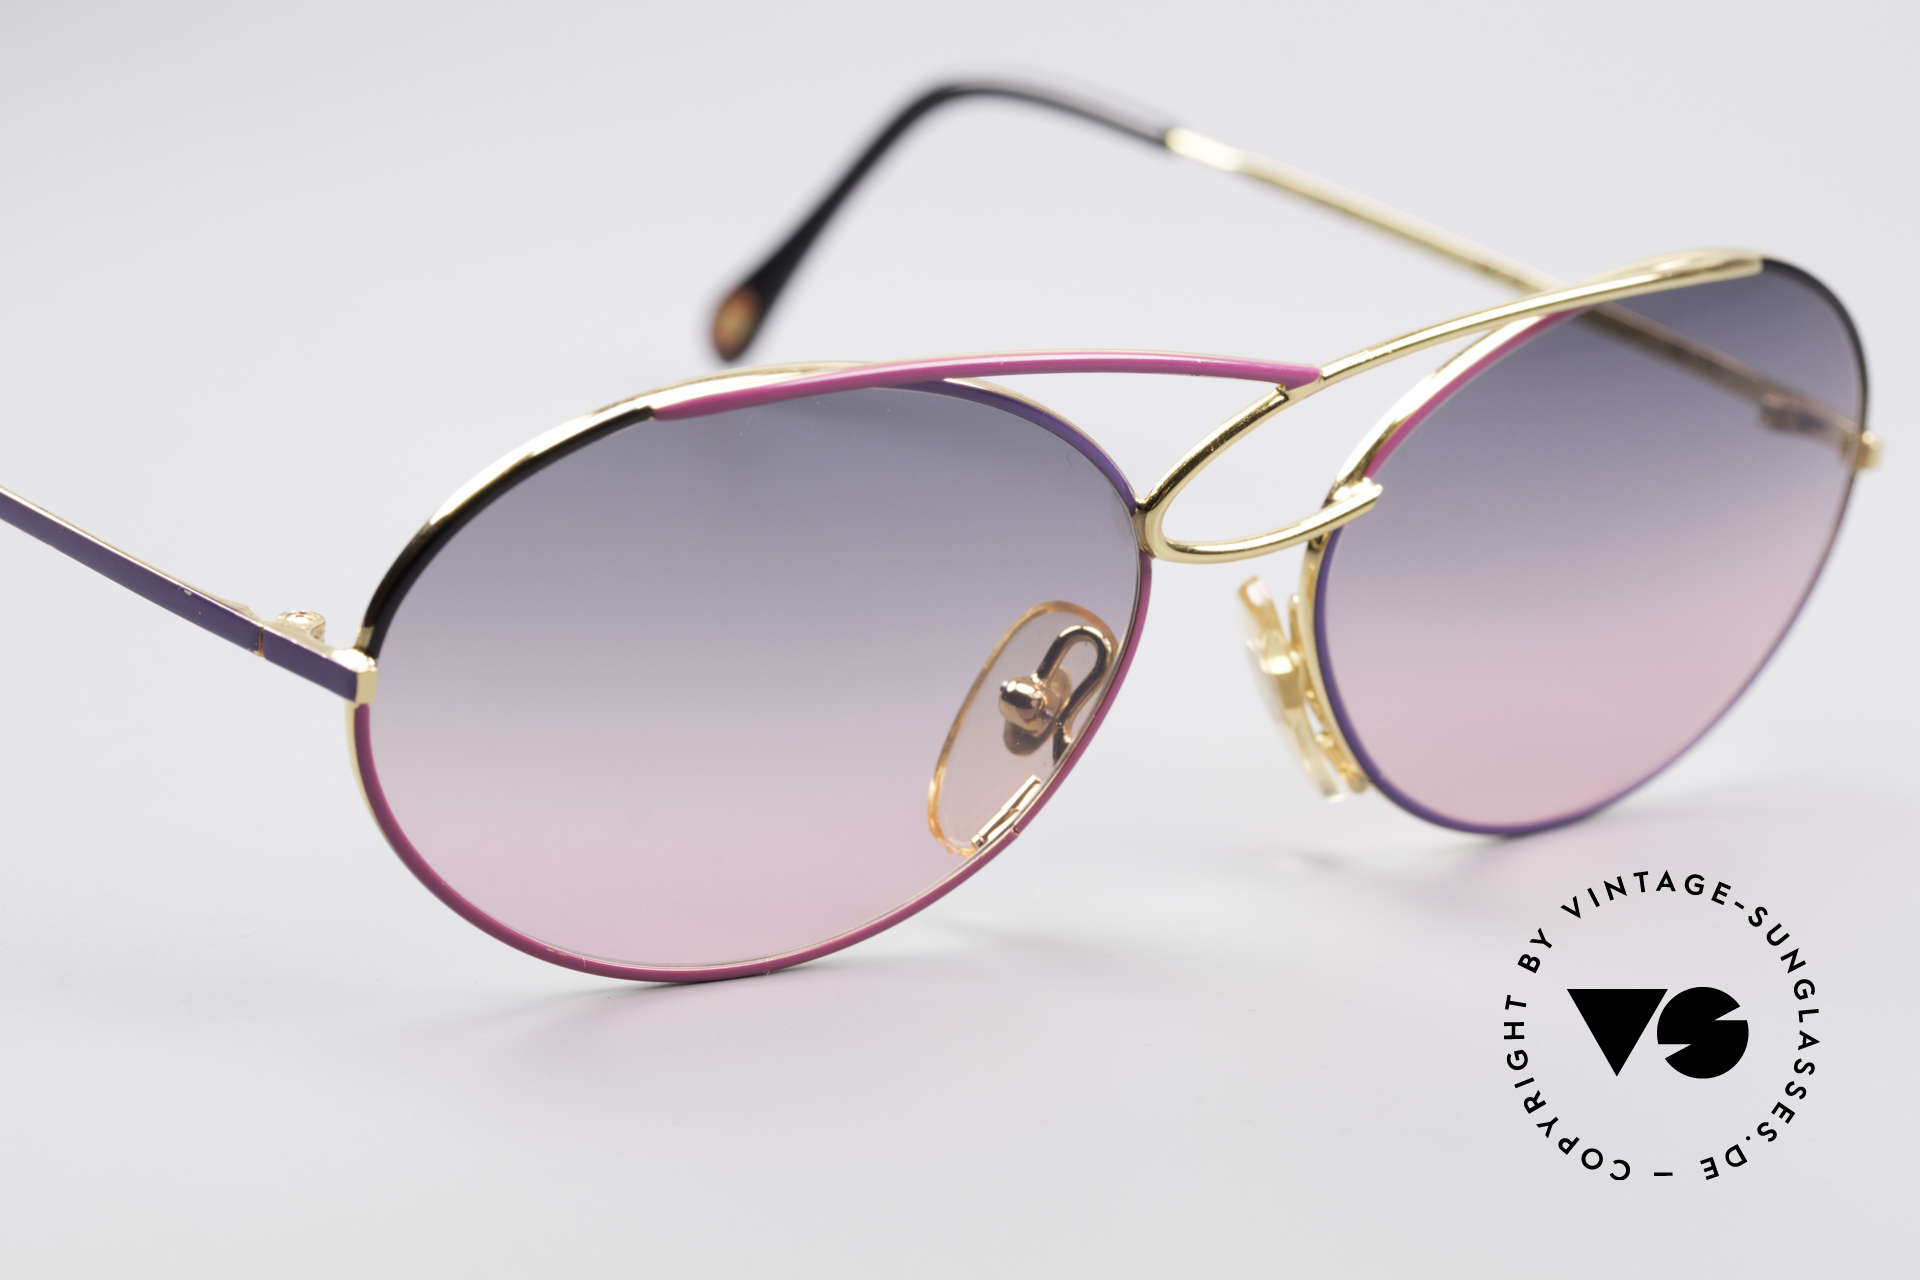 Casanova LC17 Vintage Ladies Sunglasses, NOS - unworn (like all our artistic vintage sunglasses), Made for Women